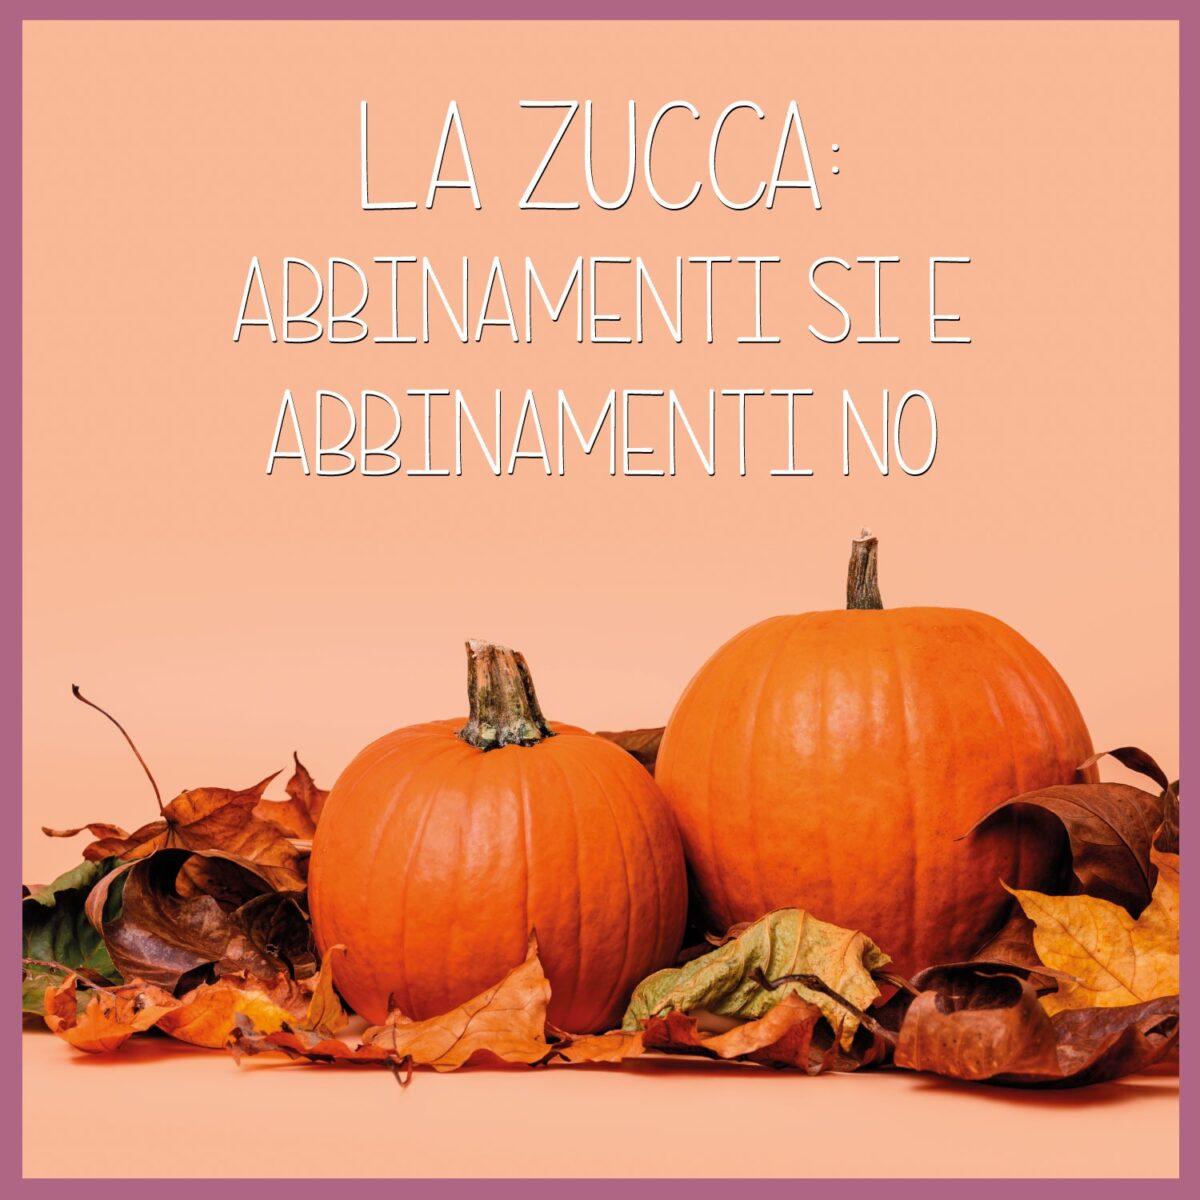 La-zucca-scopriamo--1200x1200.jpeg